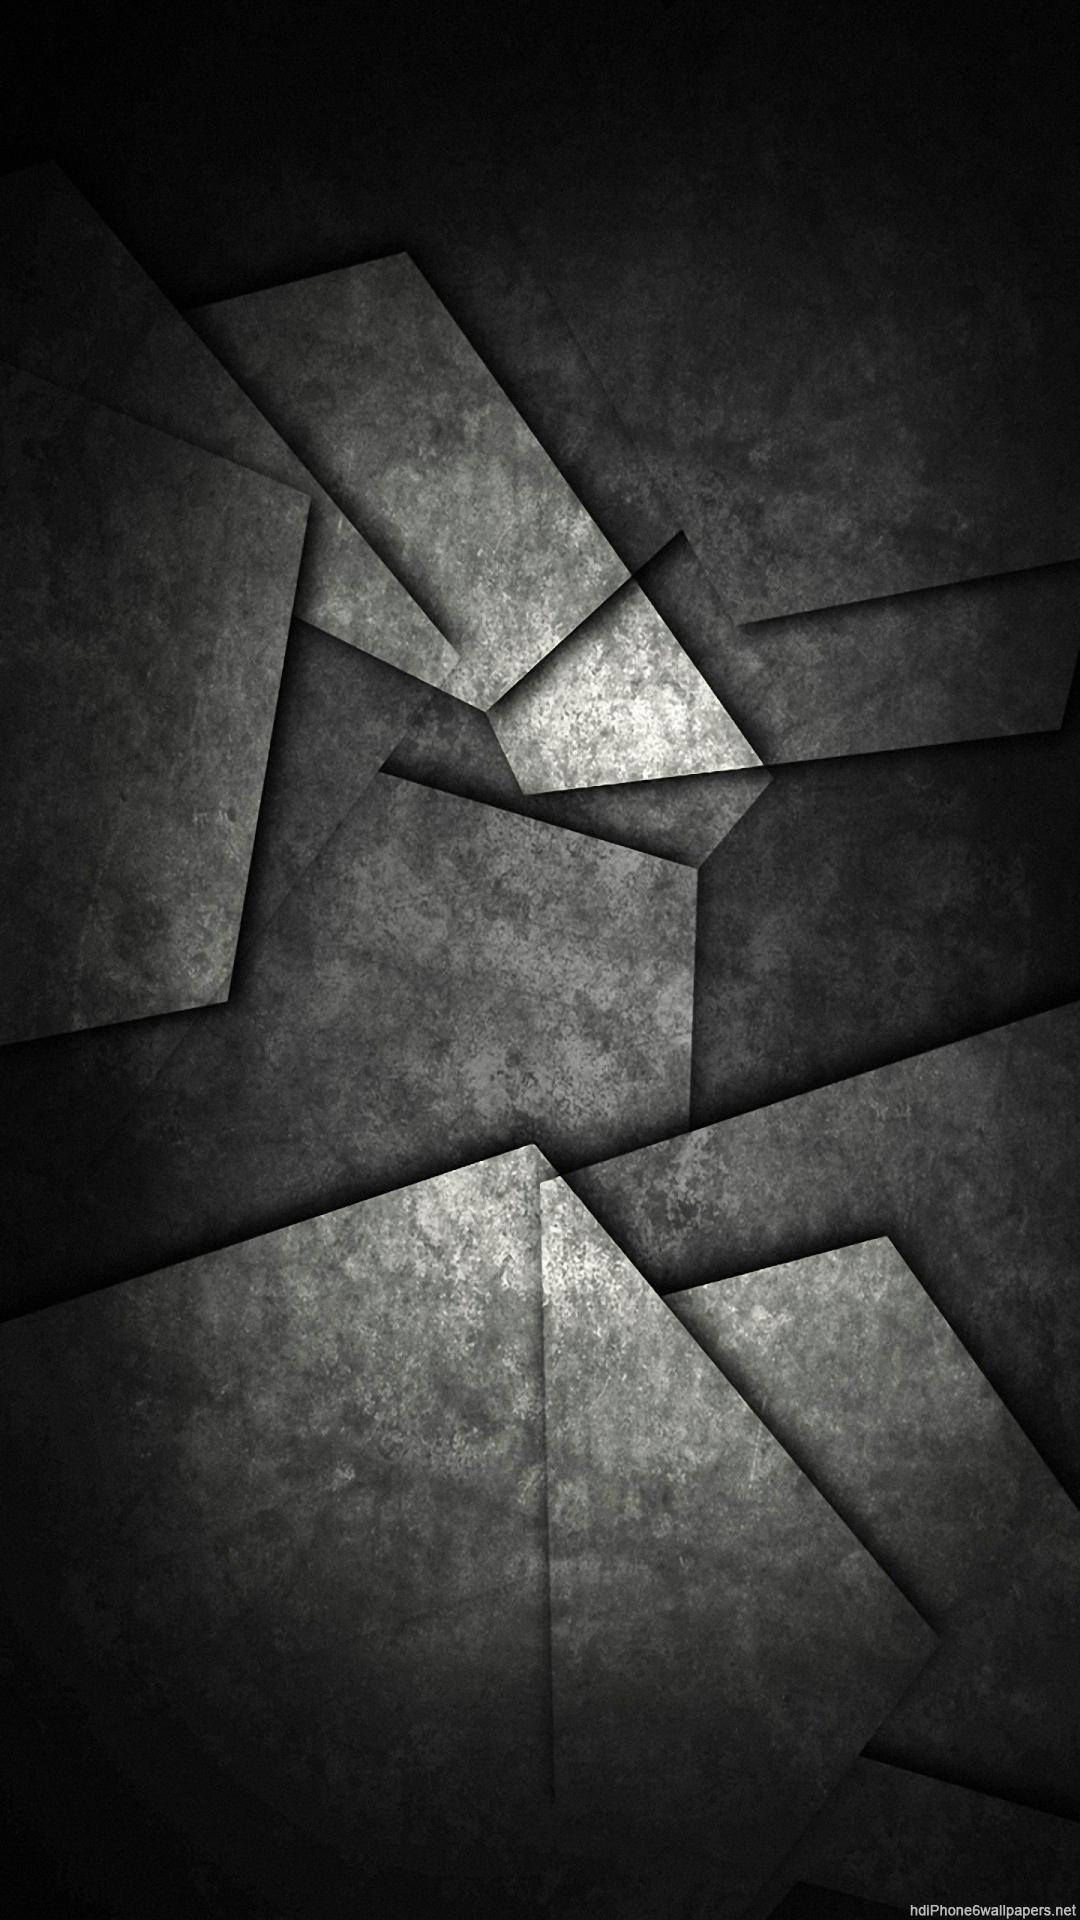 hd wallpapers iphone - sf wallpaper